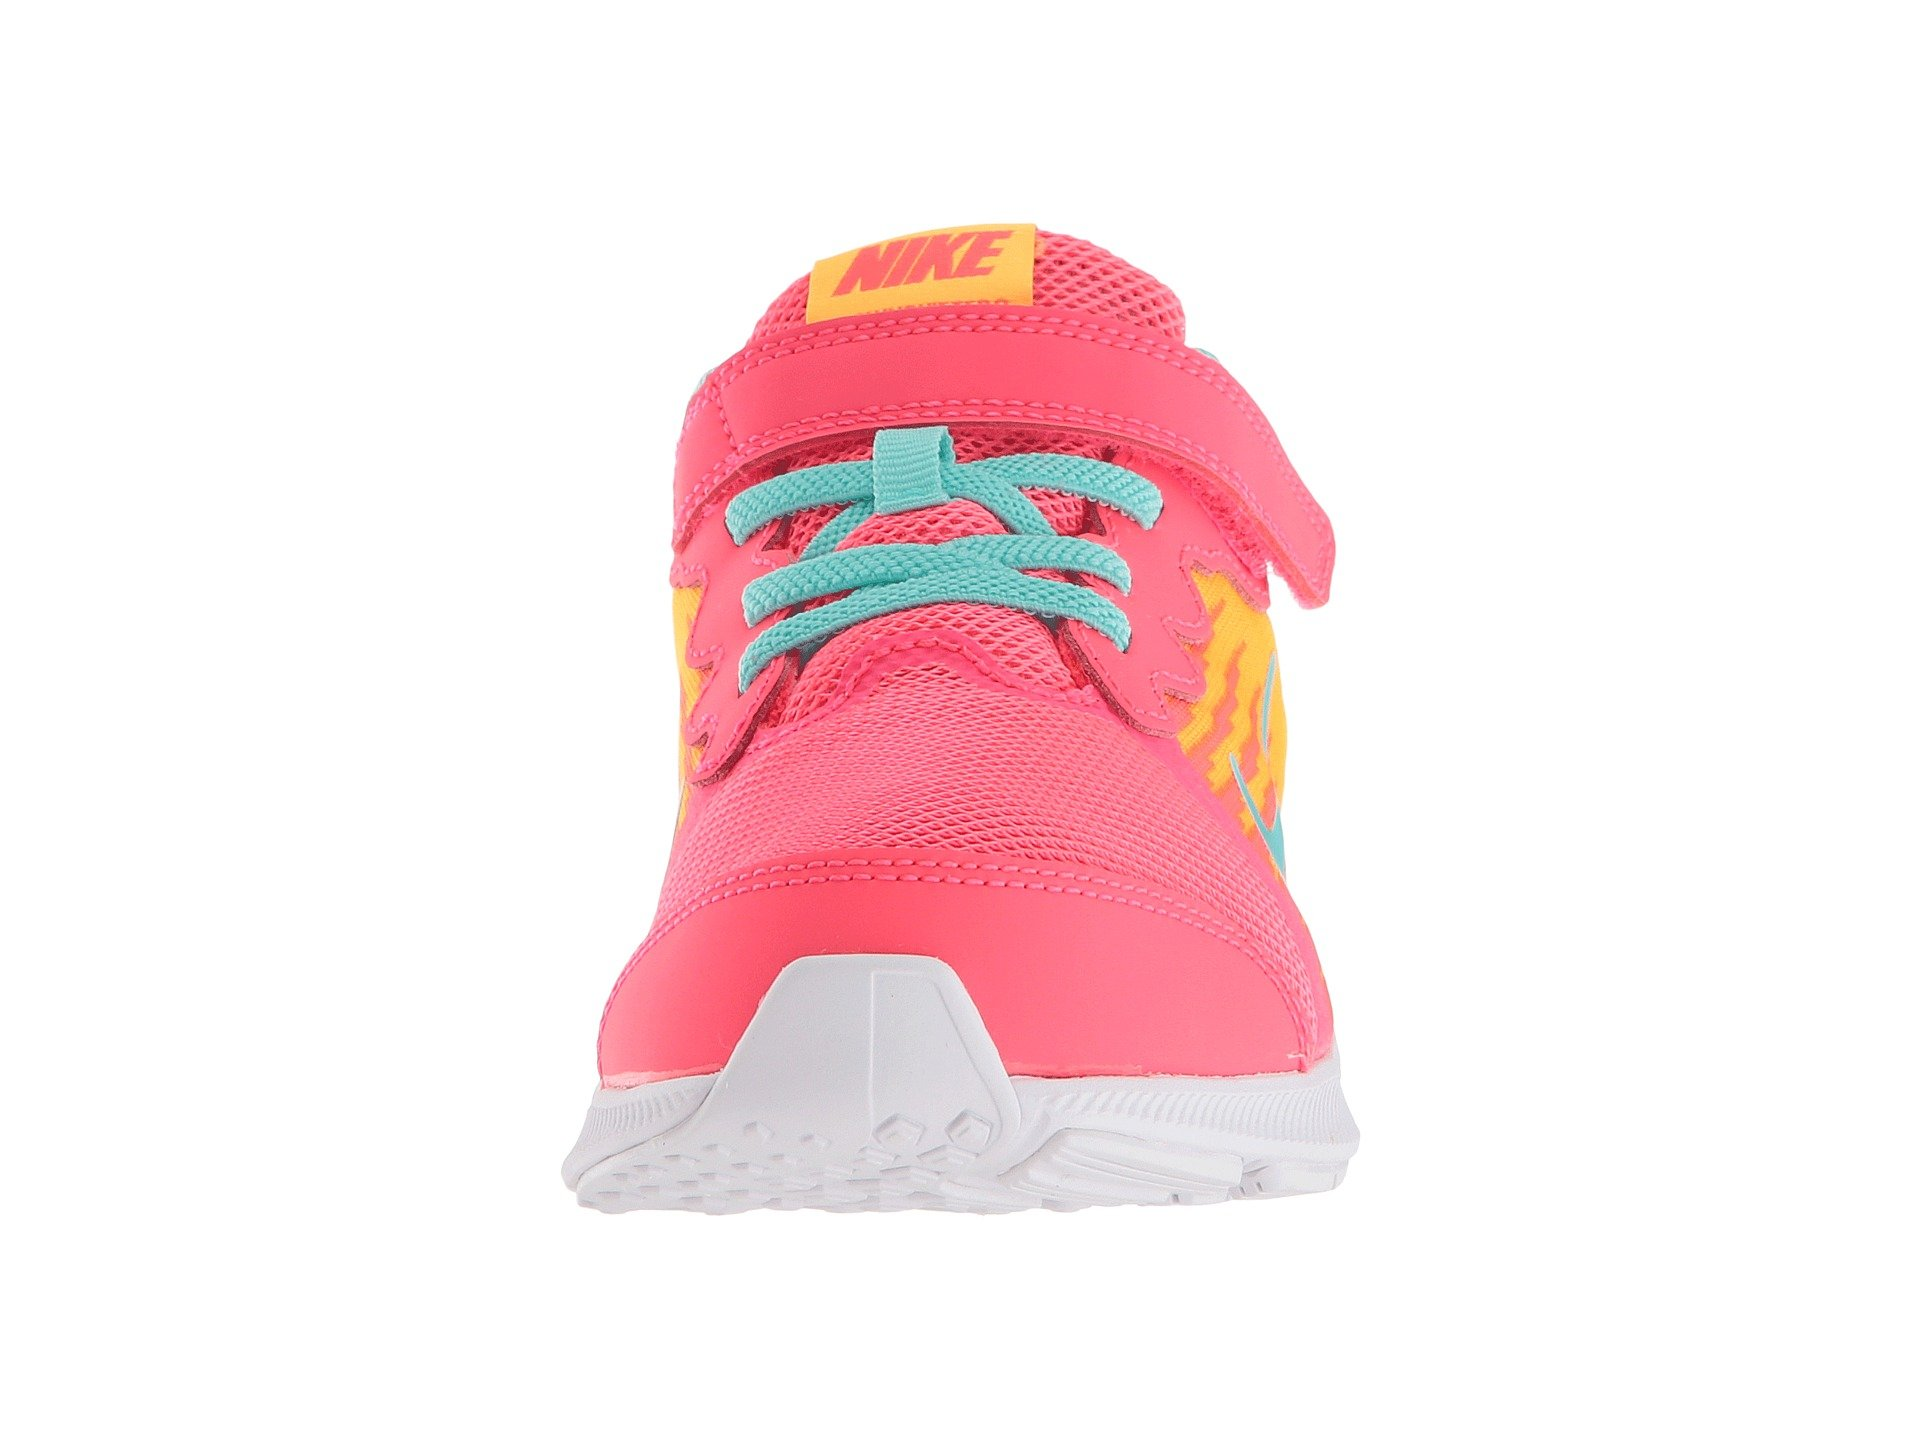 Nike Kids' Preschool Downshifter 8 Fade Running Shoes (1.5, Red/Green) by Nike (Image #5)